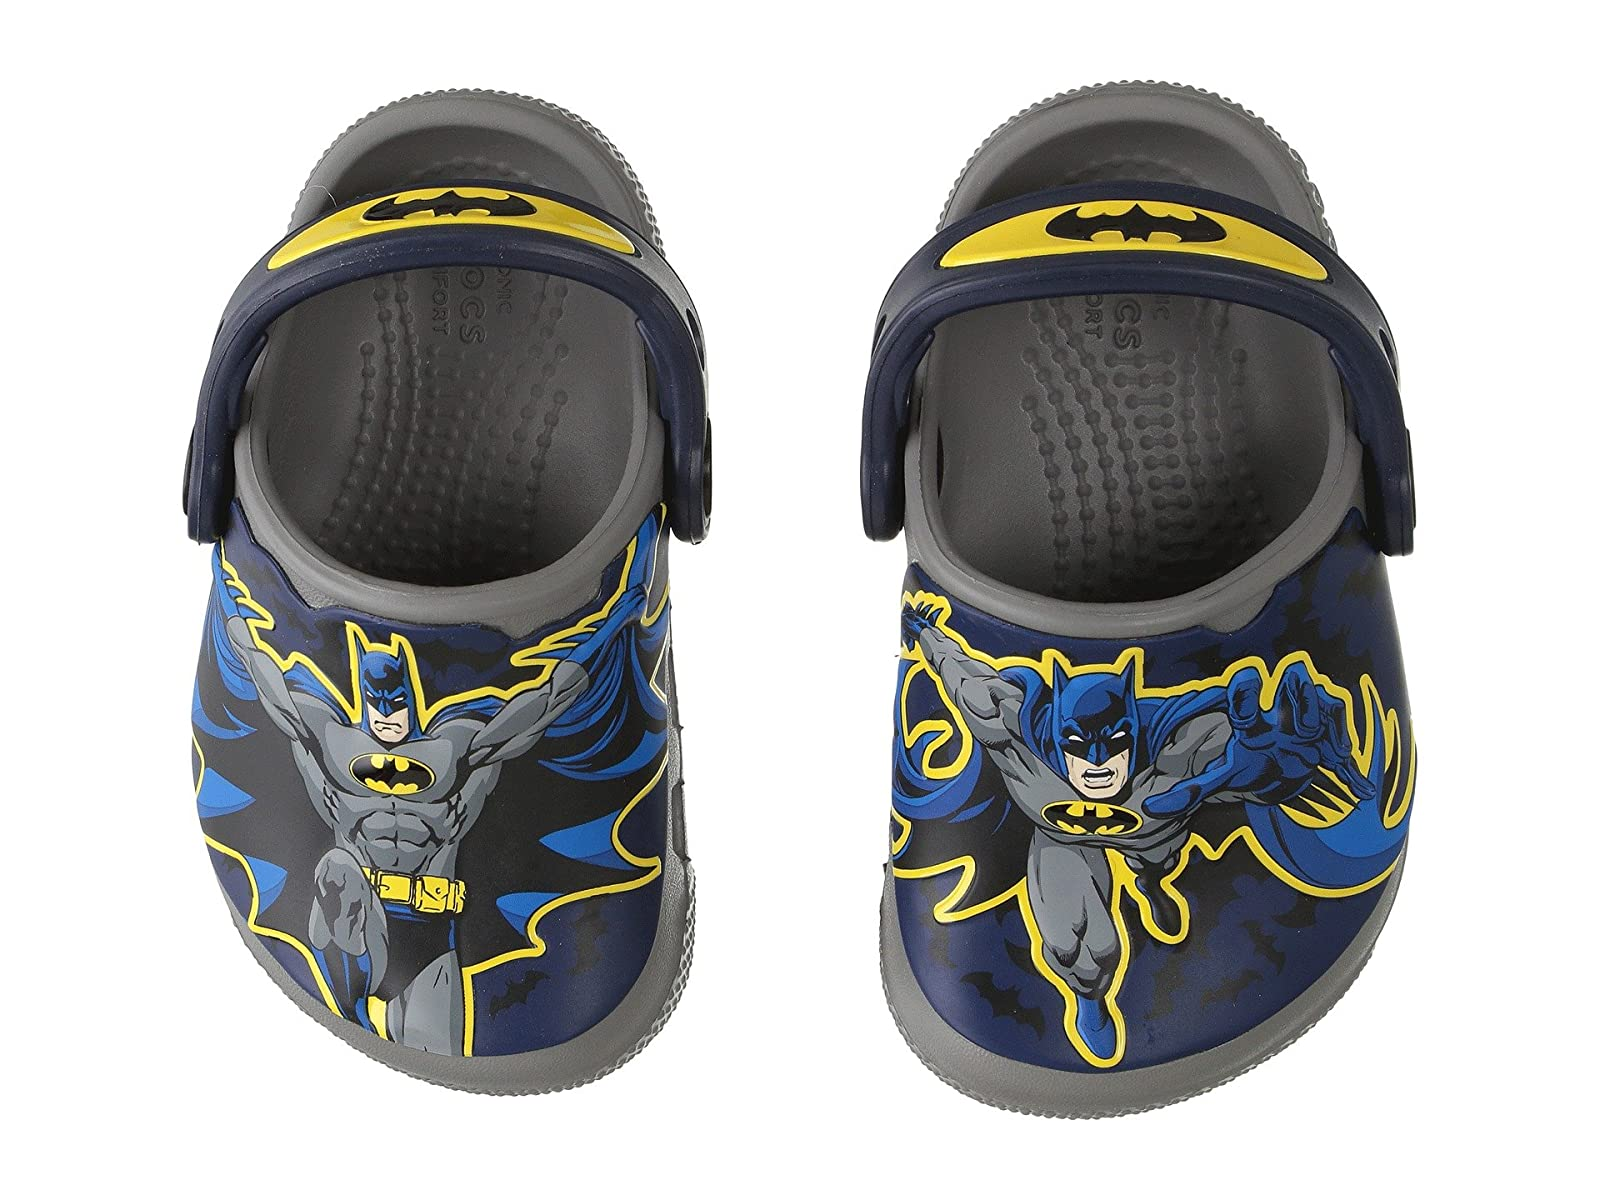 Crocs Kids CrocsFunLab CrocsFunLab Kids Batman (Toddler/Little Kid) b4c0a2